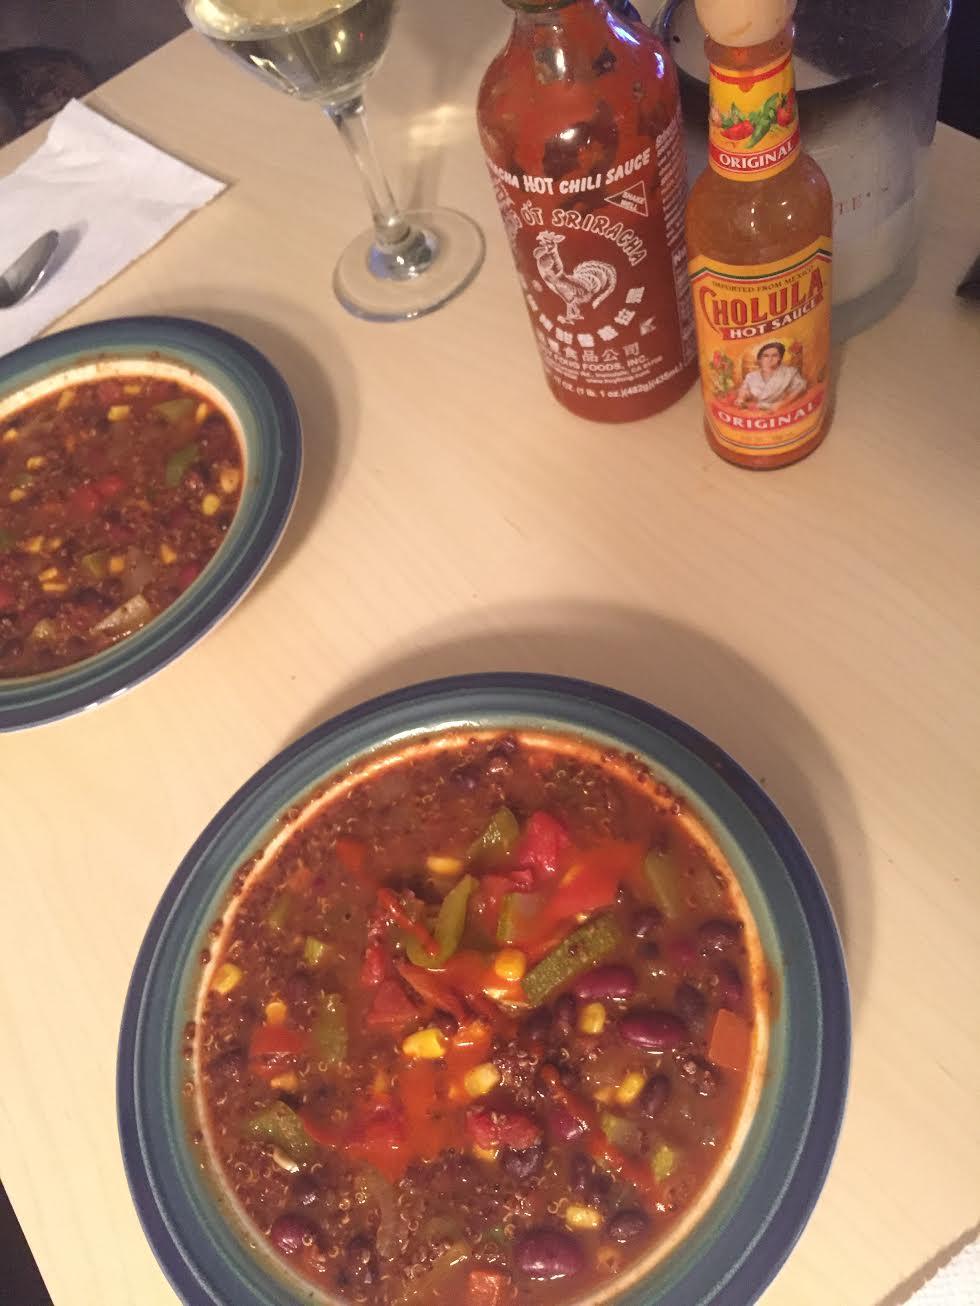 Quinoa Chili Dinner For Two